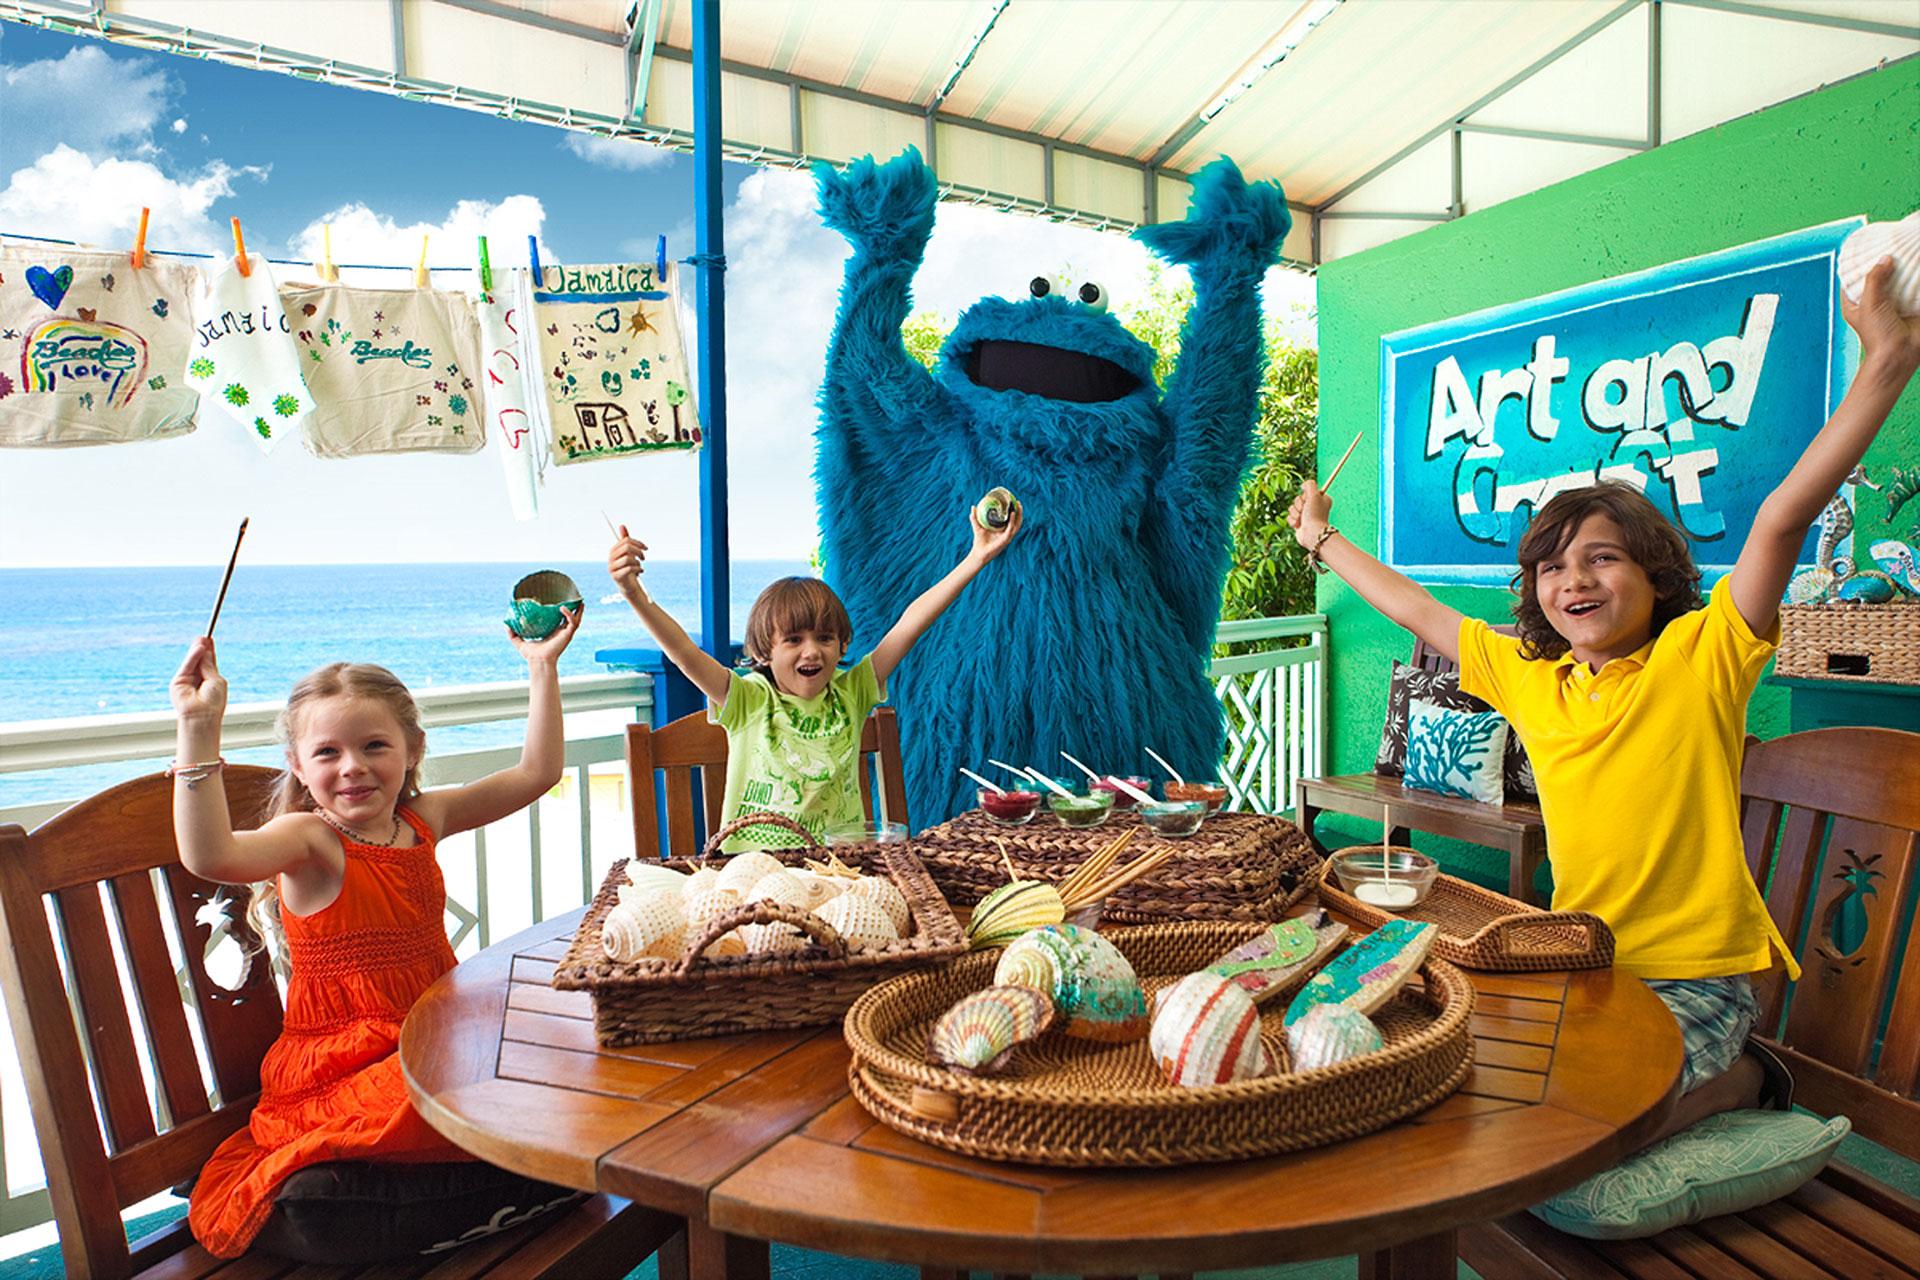 Beaches Sesame Street Program; Courtesy of Beaches Resorts